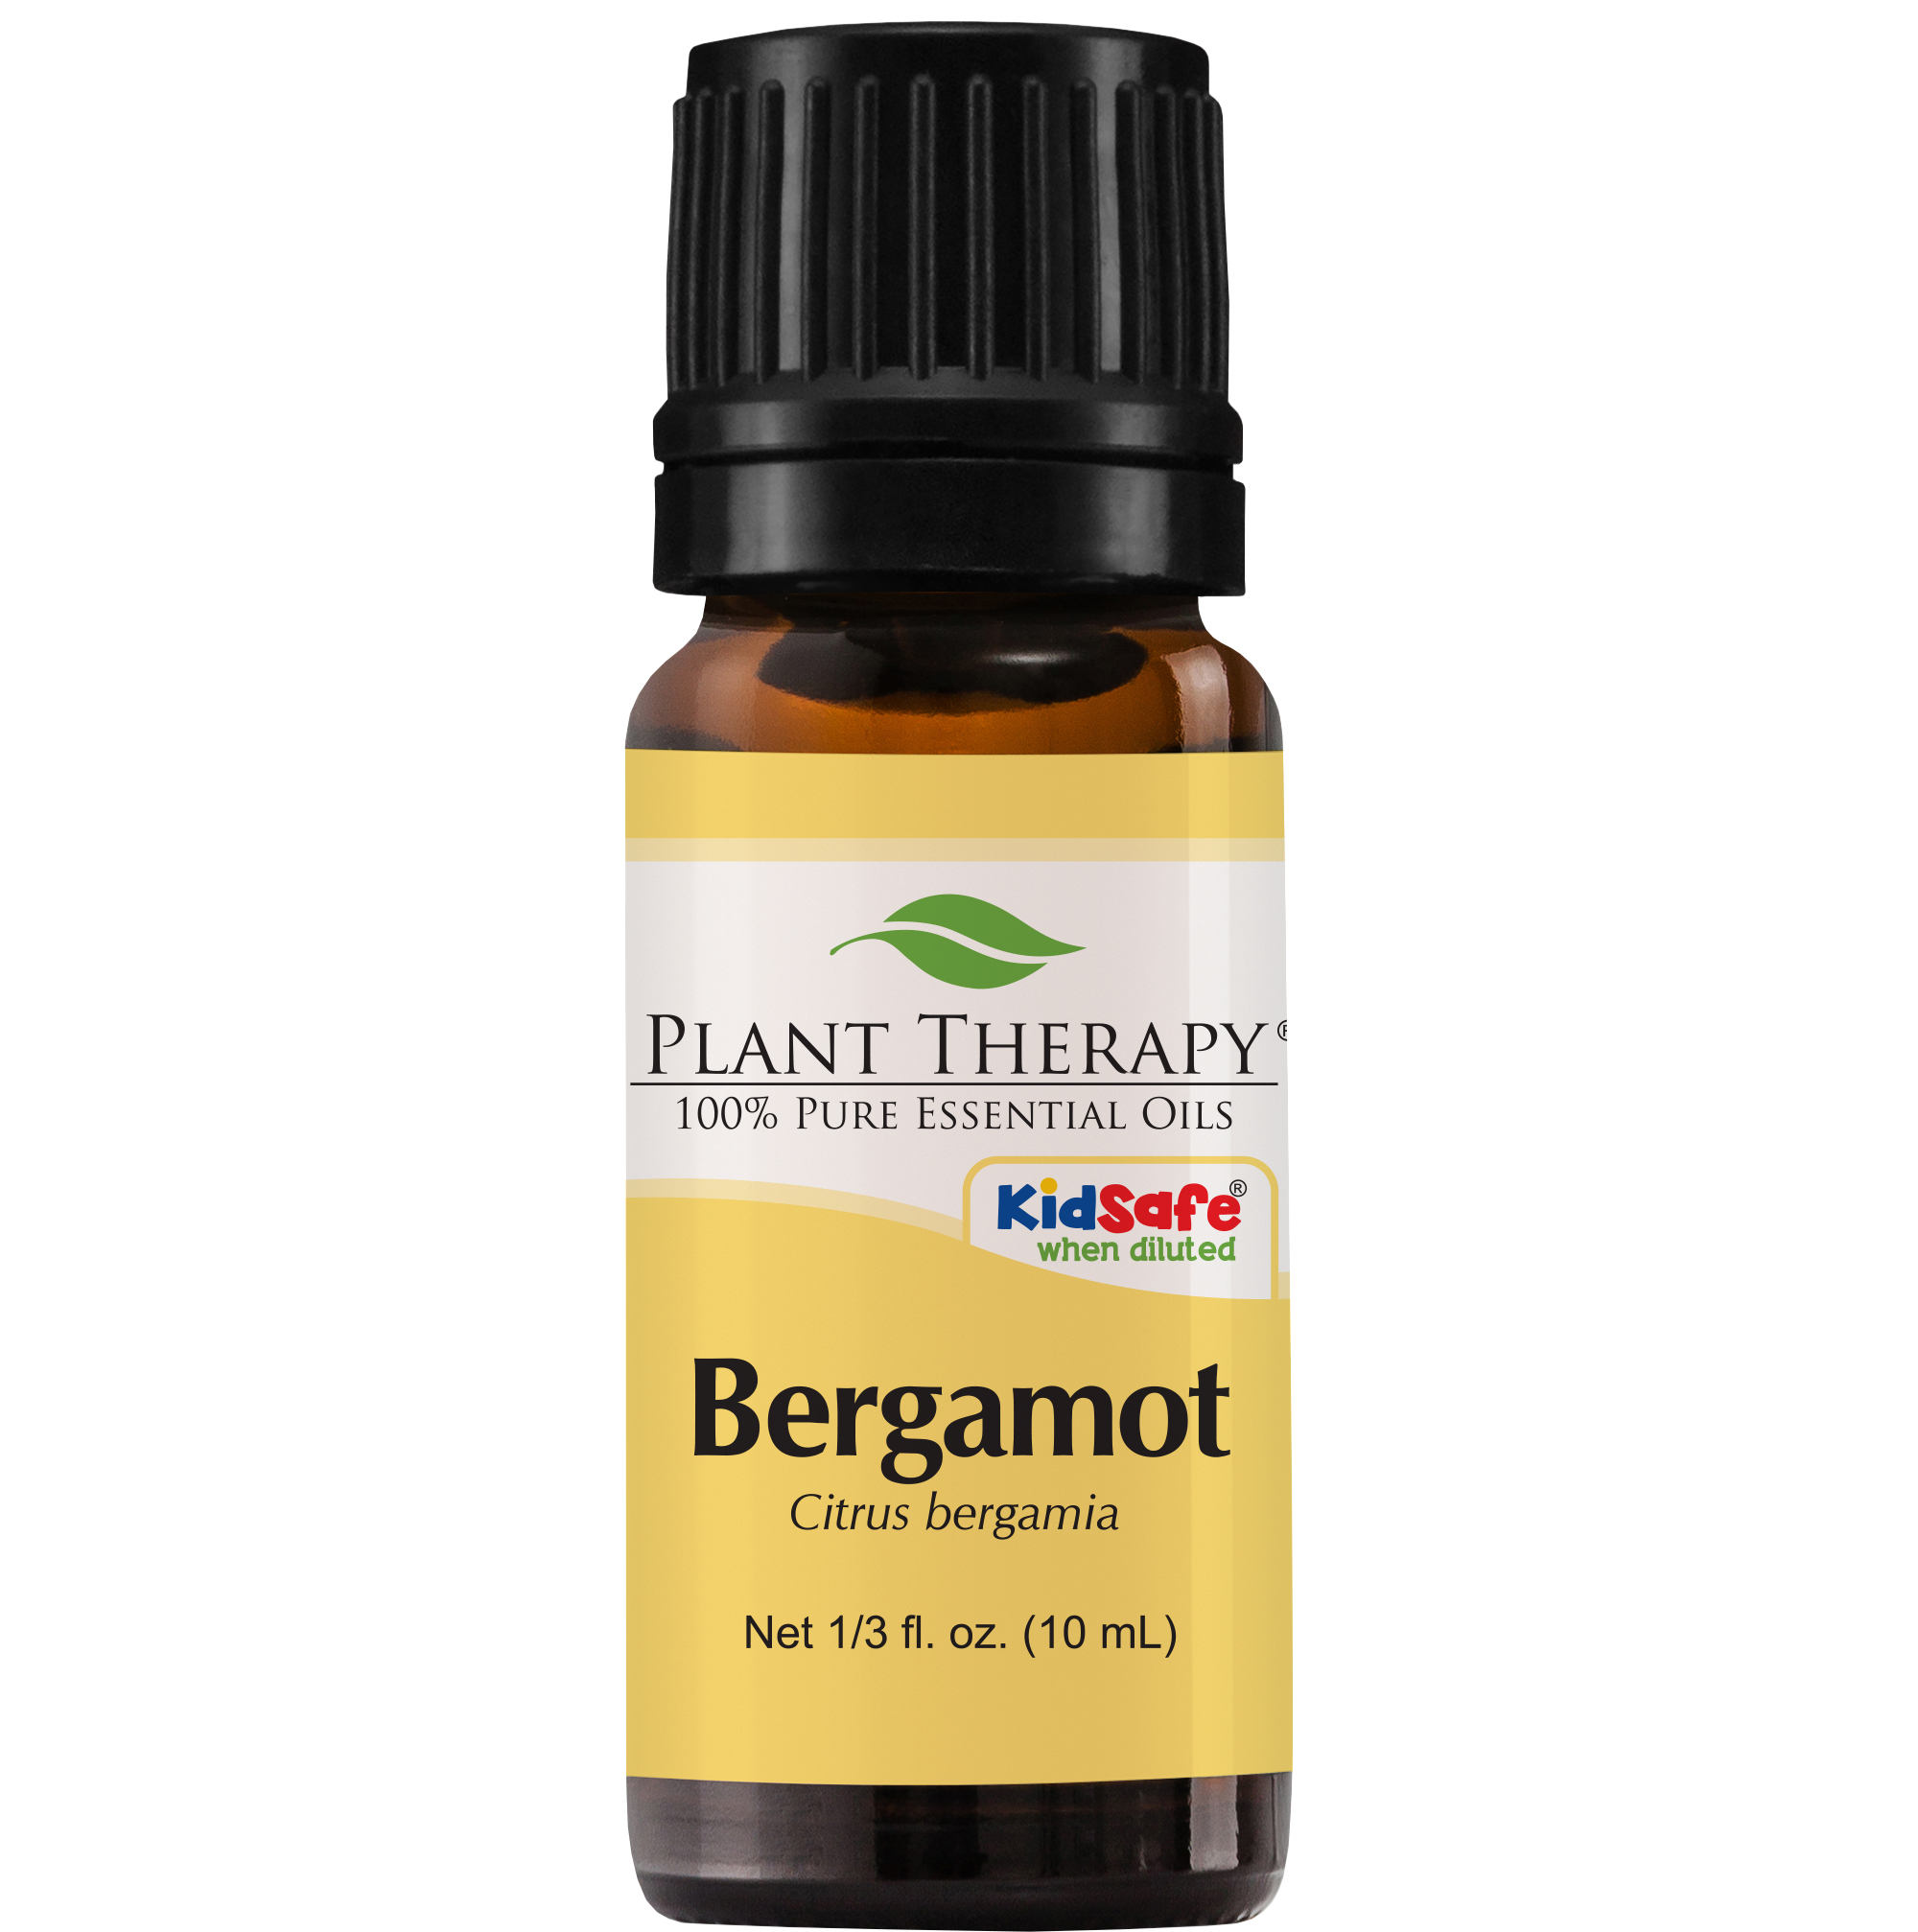 Plant Therapy Bergamot Essential Oil | 100% Pure, Undiluted, Natural Aromatherapy, Therapeutic Grade | 10 mL (1/3 oz)